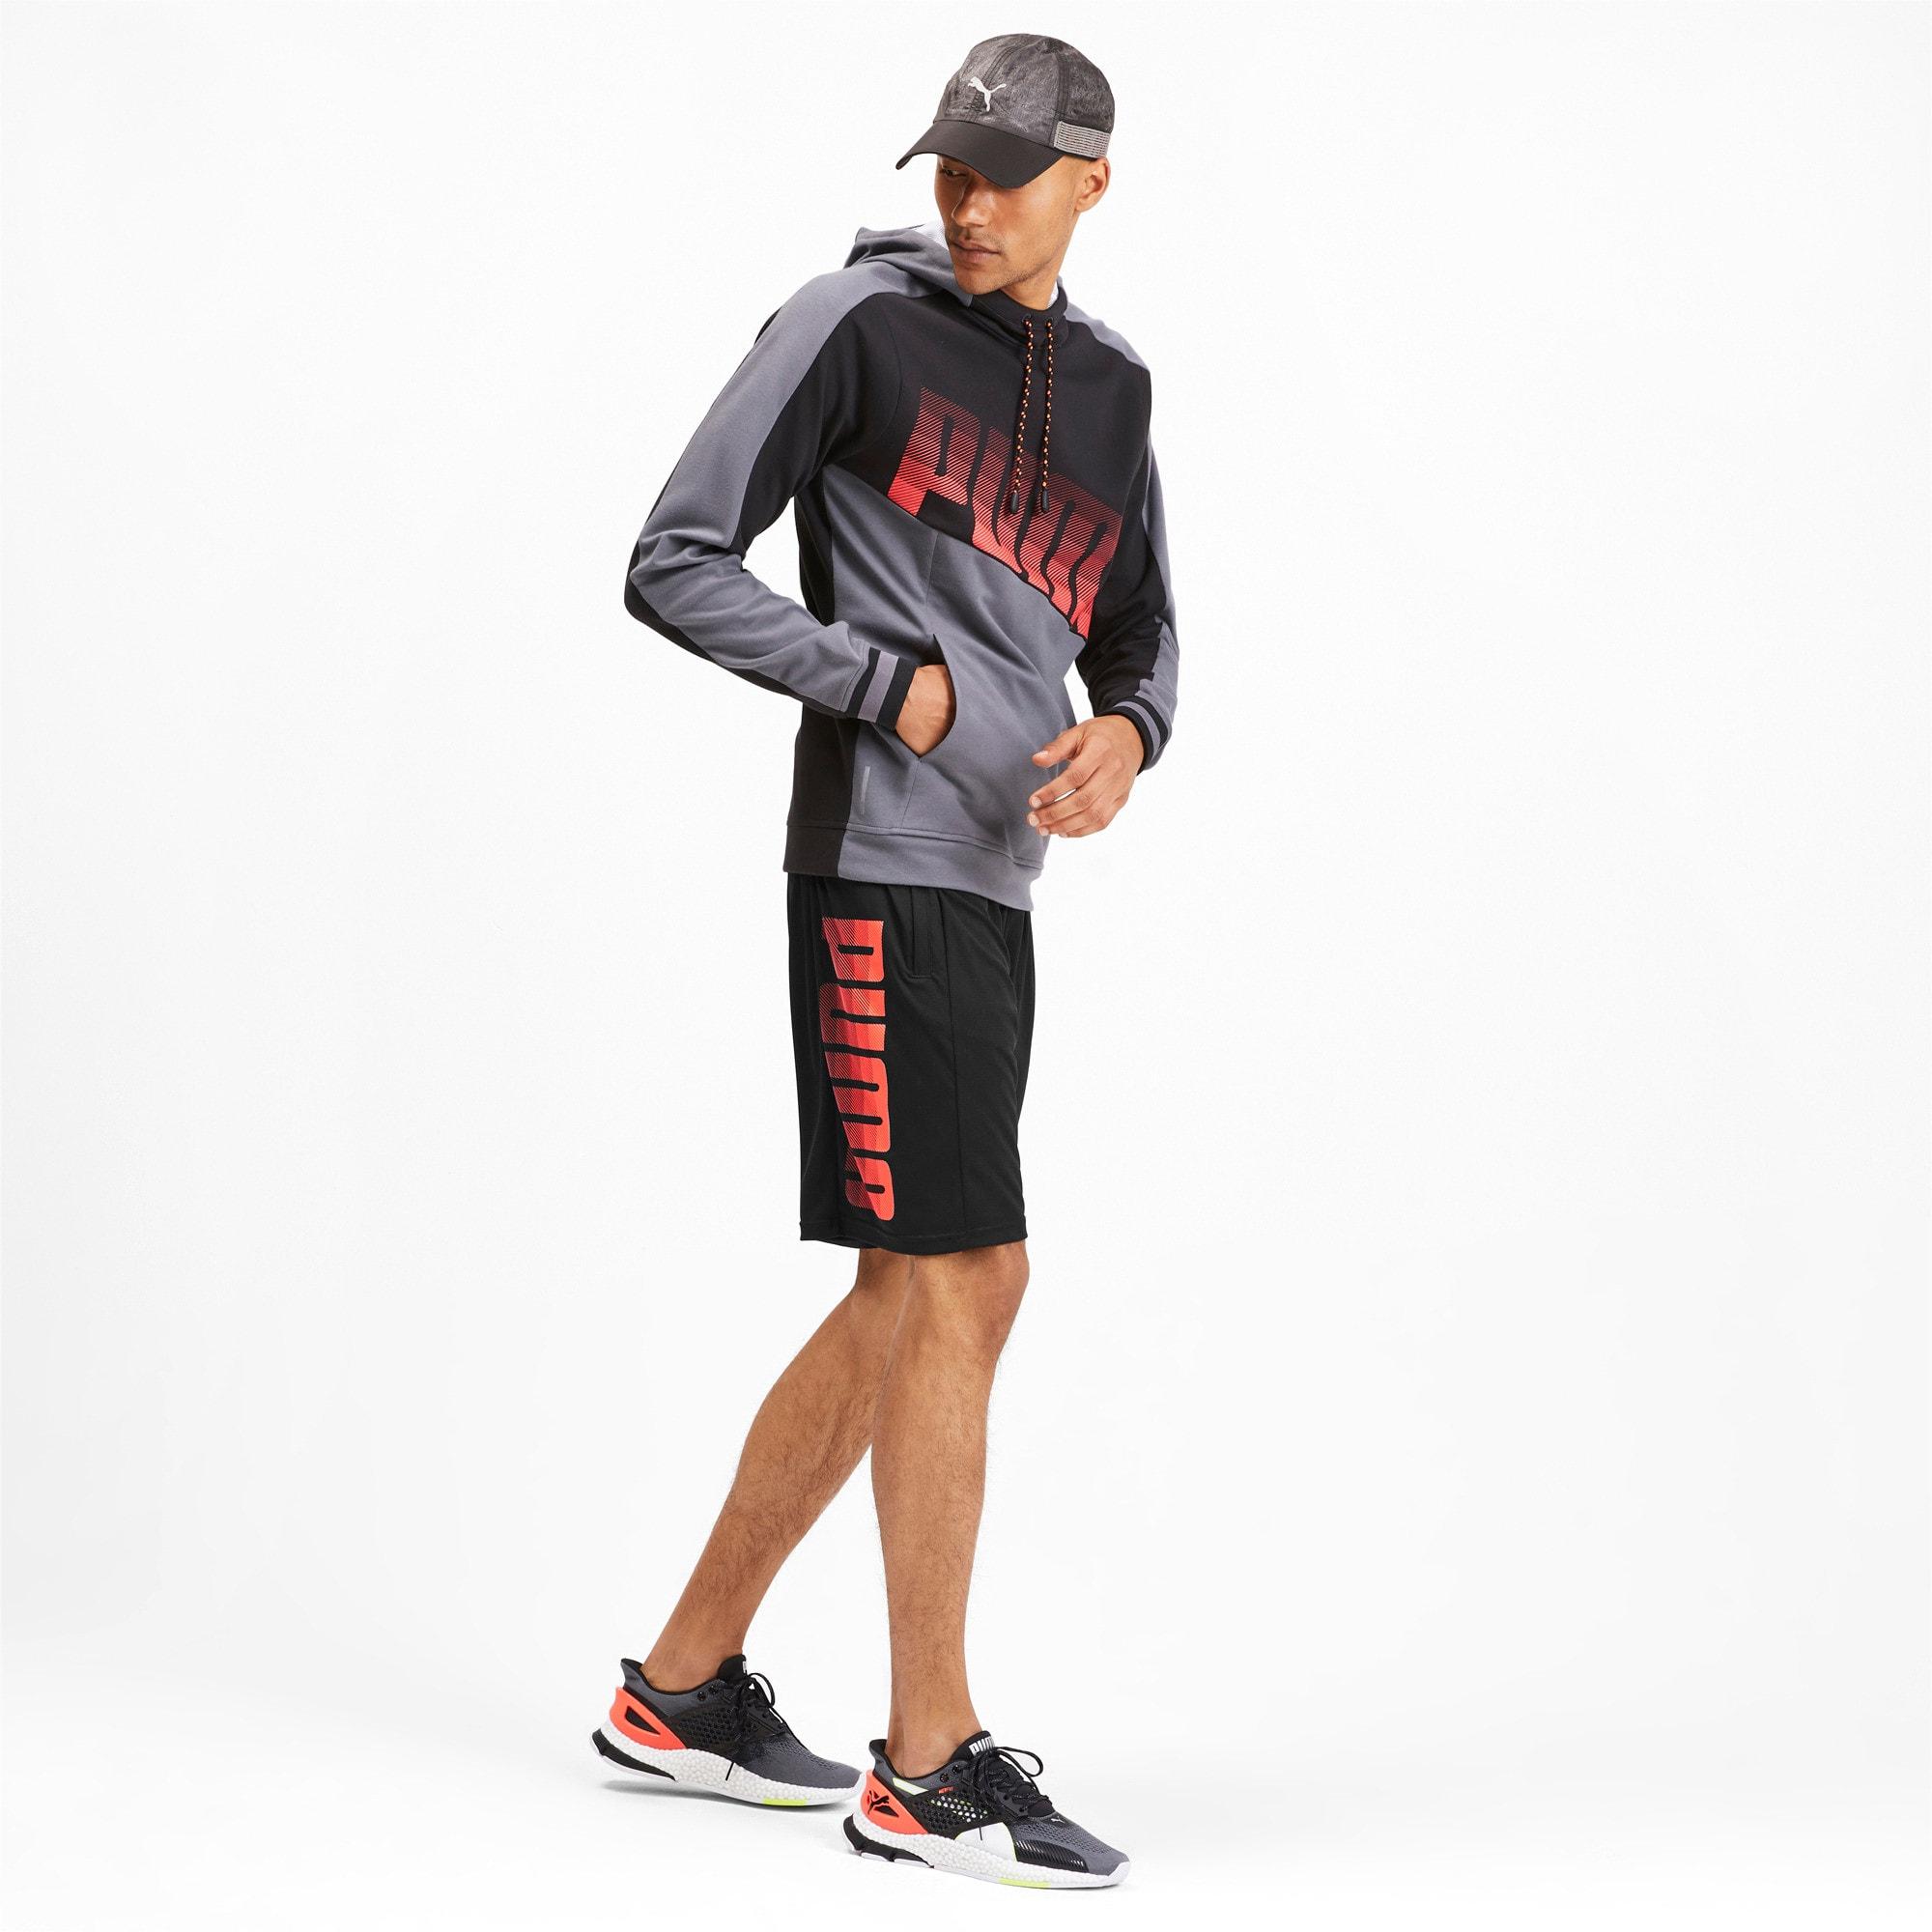 Thumbnail 3 of Collective Men's Knit Shorts, Puma Black-Nrgy Red, medium